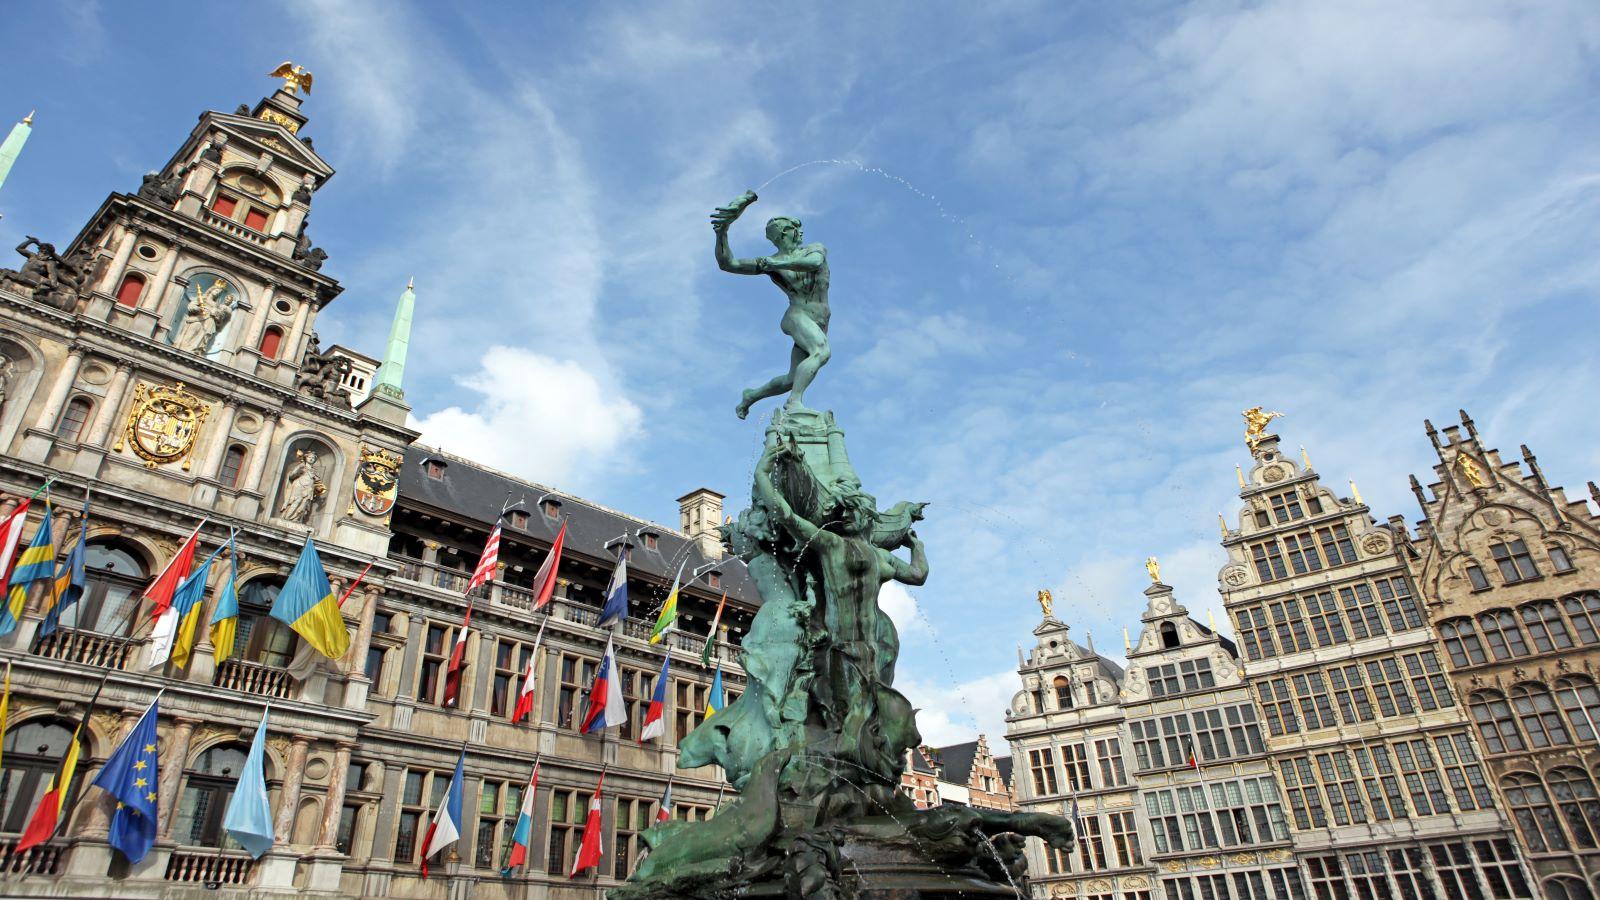 Brabo Statue in front of the City Hall in Antwerp, Belgium.